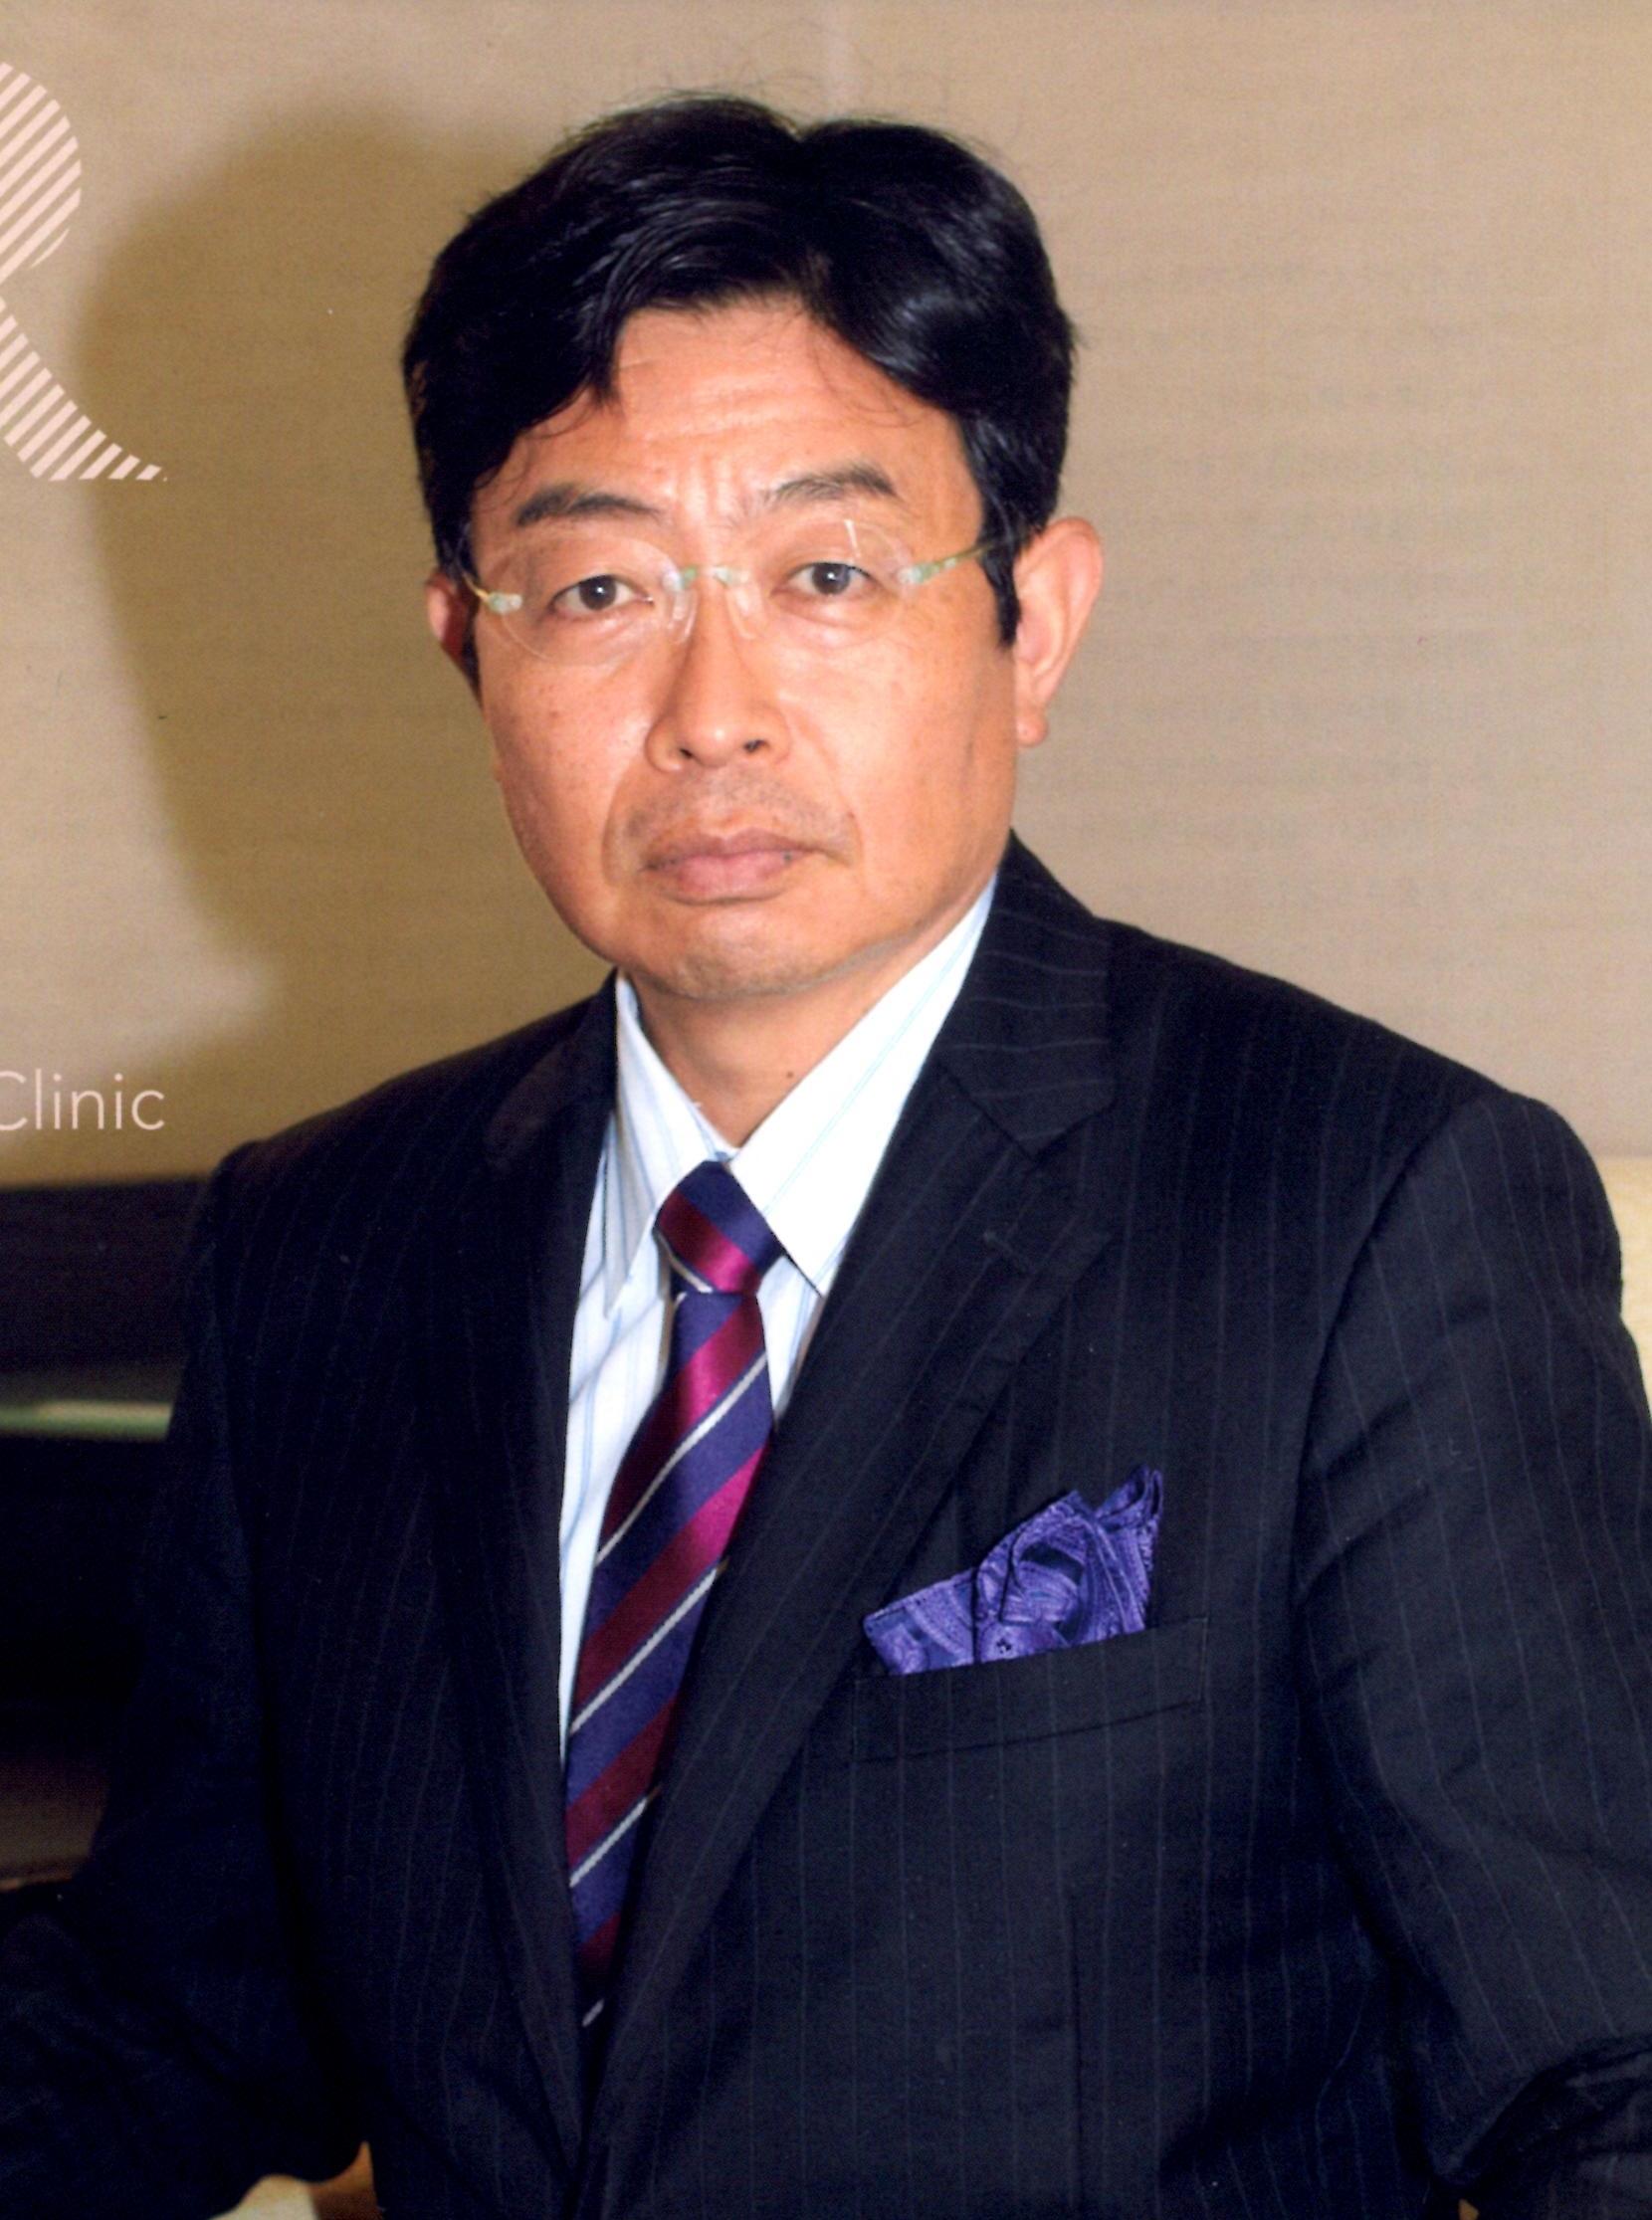 Meetings International - Dental Meeting 2018 Conference Keynote Speaker Yoshiro Fujii photo